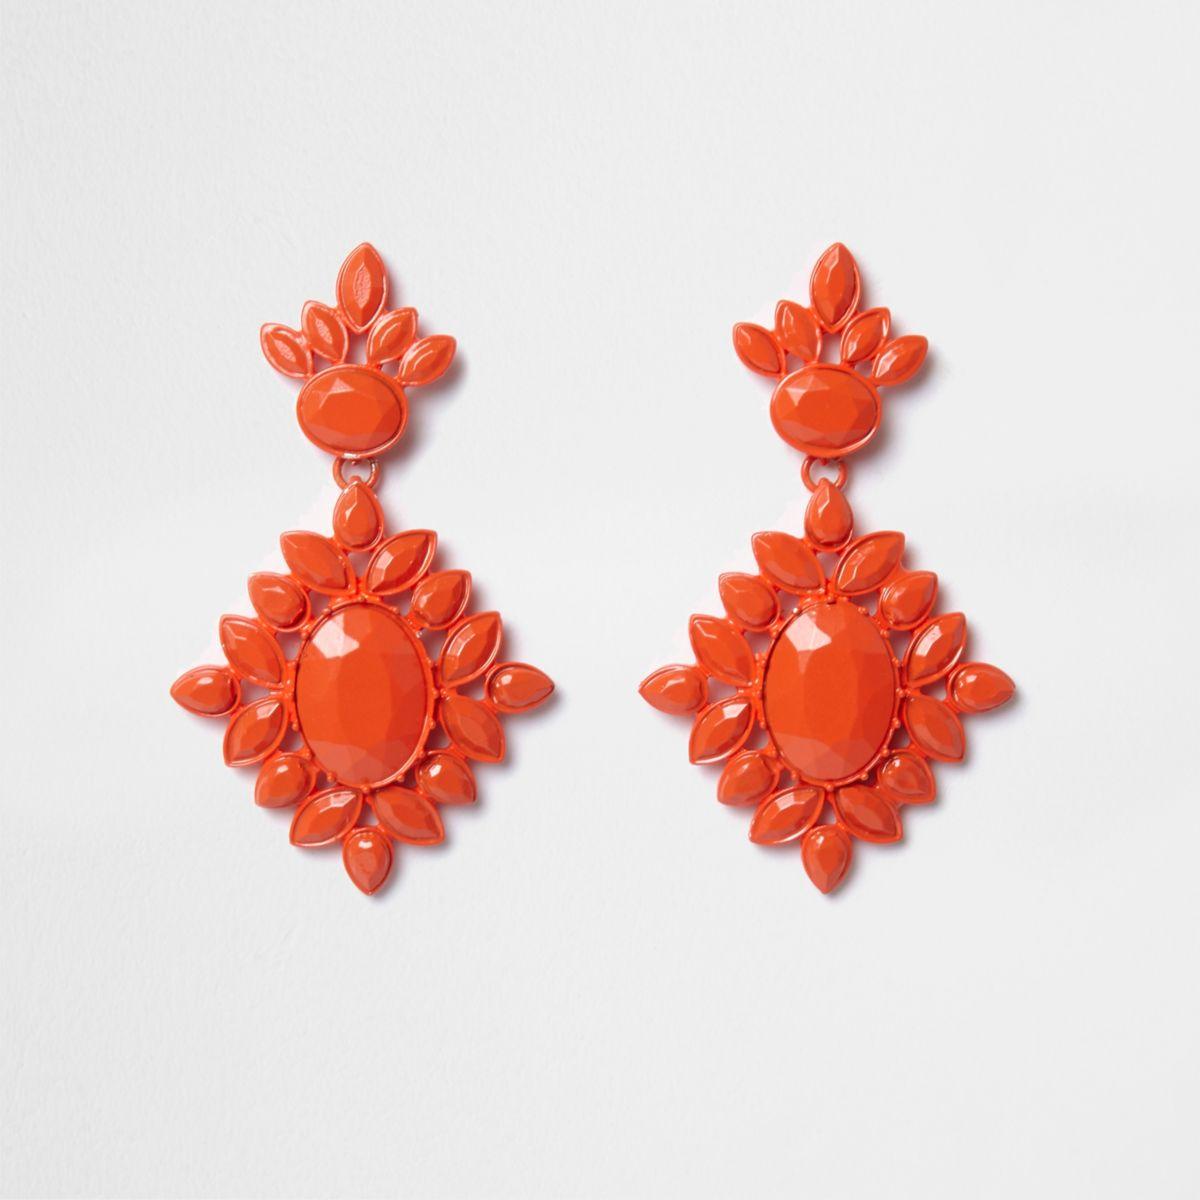 Orange jewel encrusted drop earrings